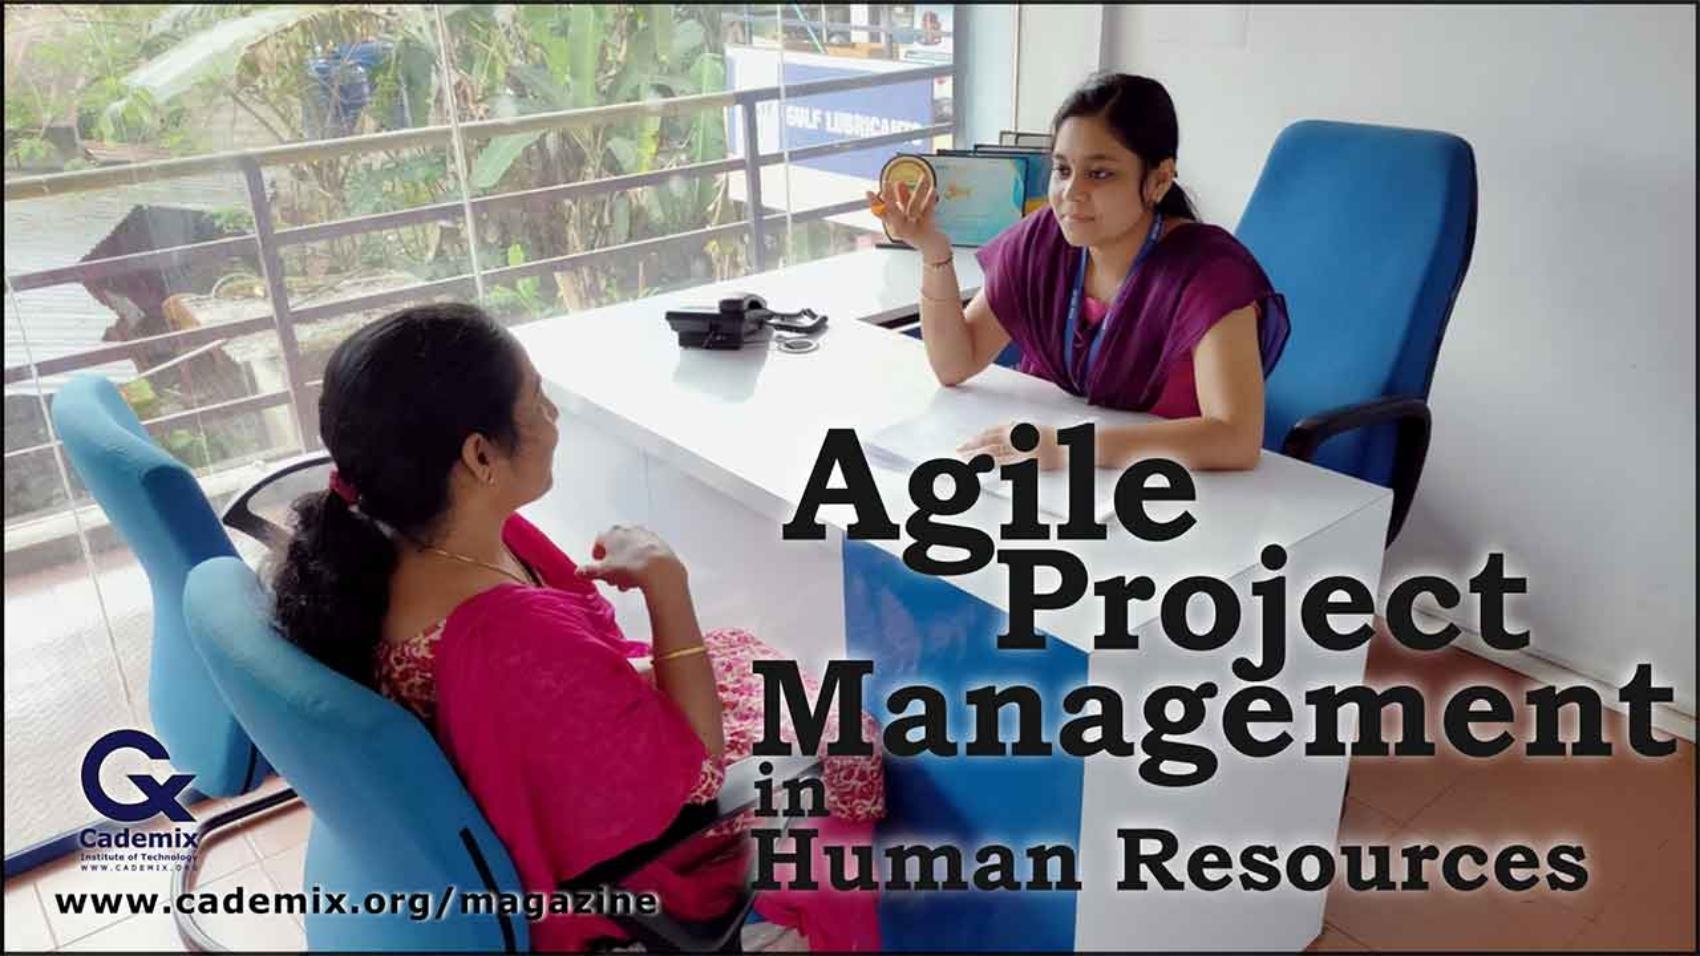 Agile Project Management Article in Human Resources Bonisha Babu Cademix Magazine